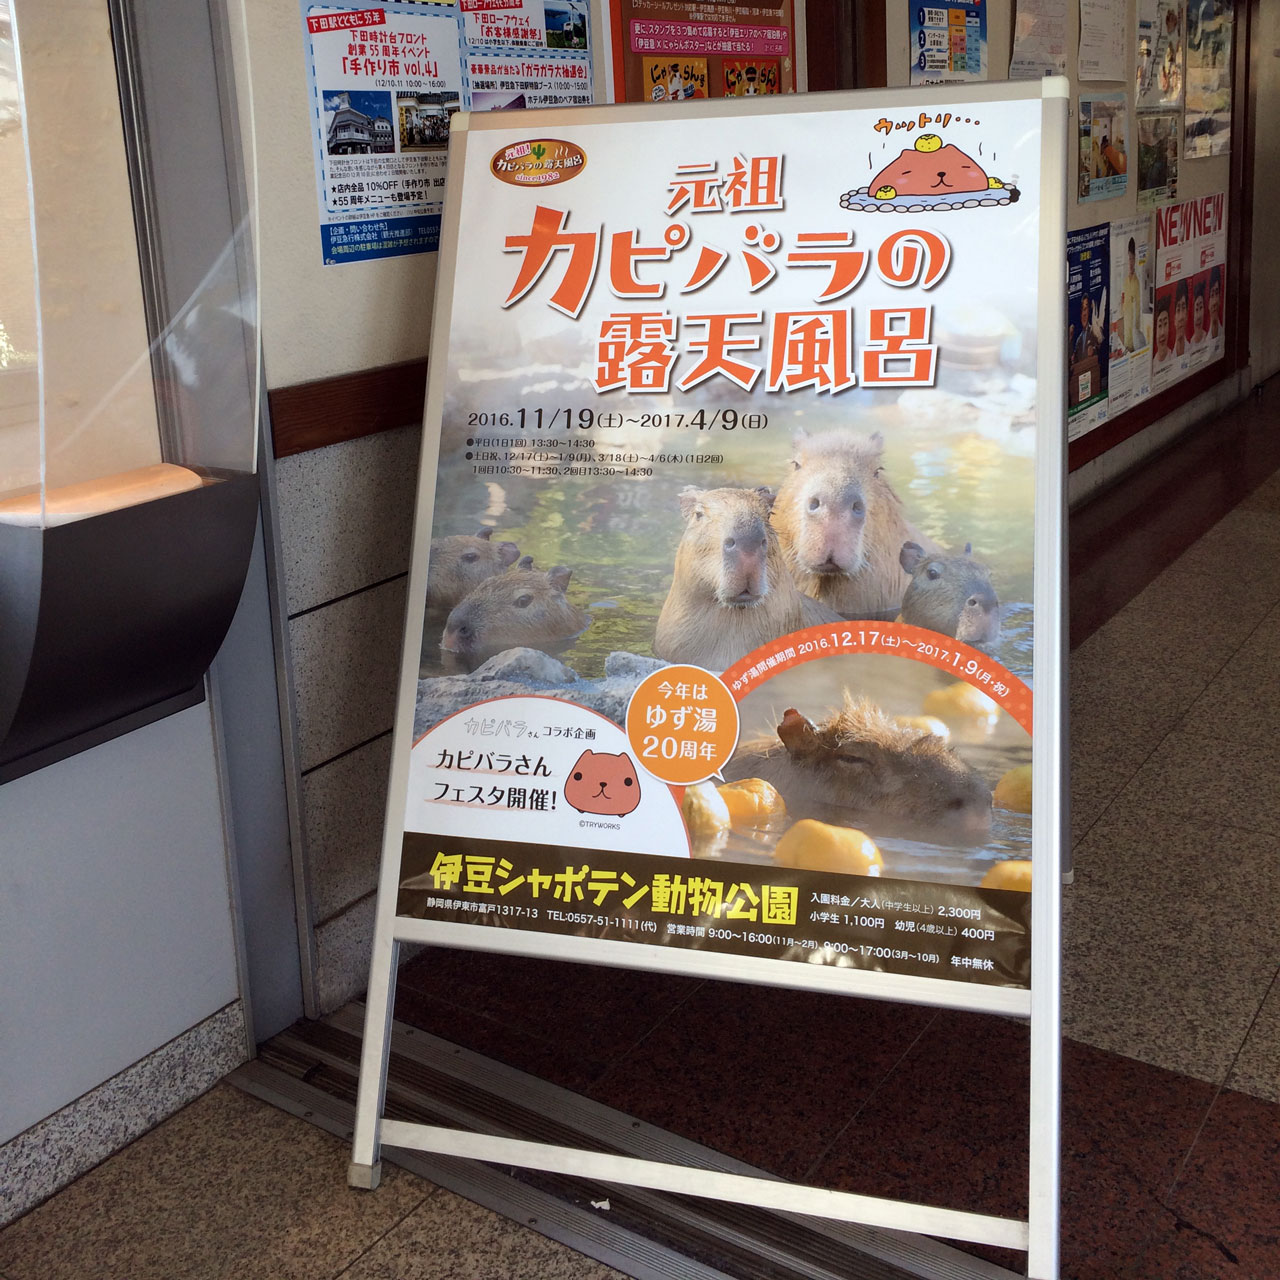 sandwich board ad for izu shaboten capybara onsen